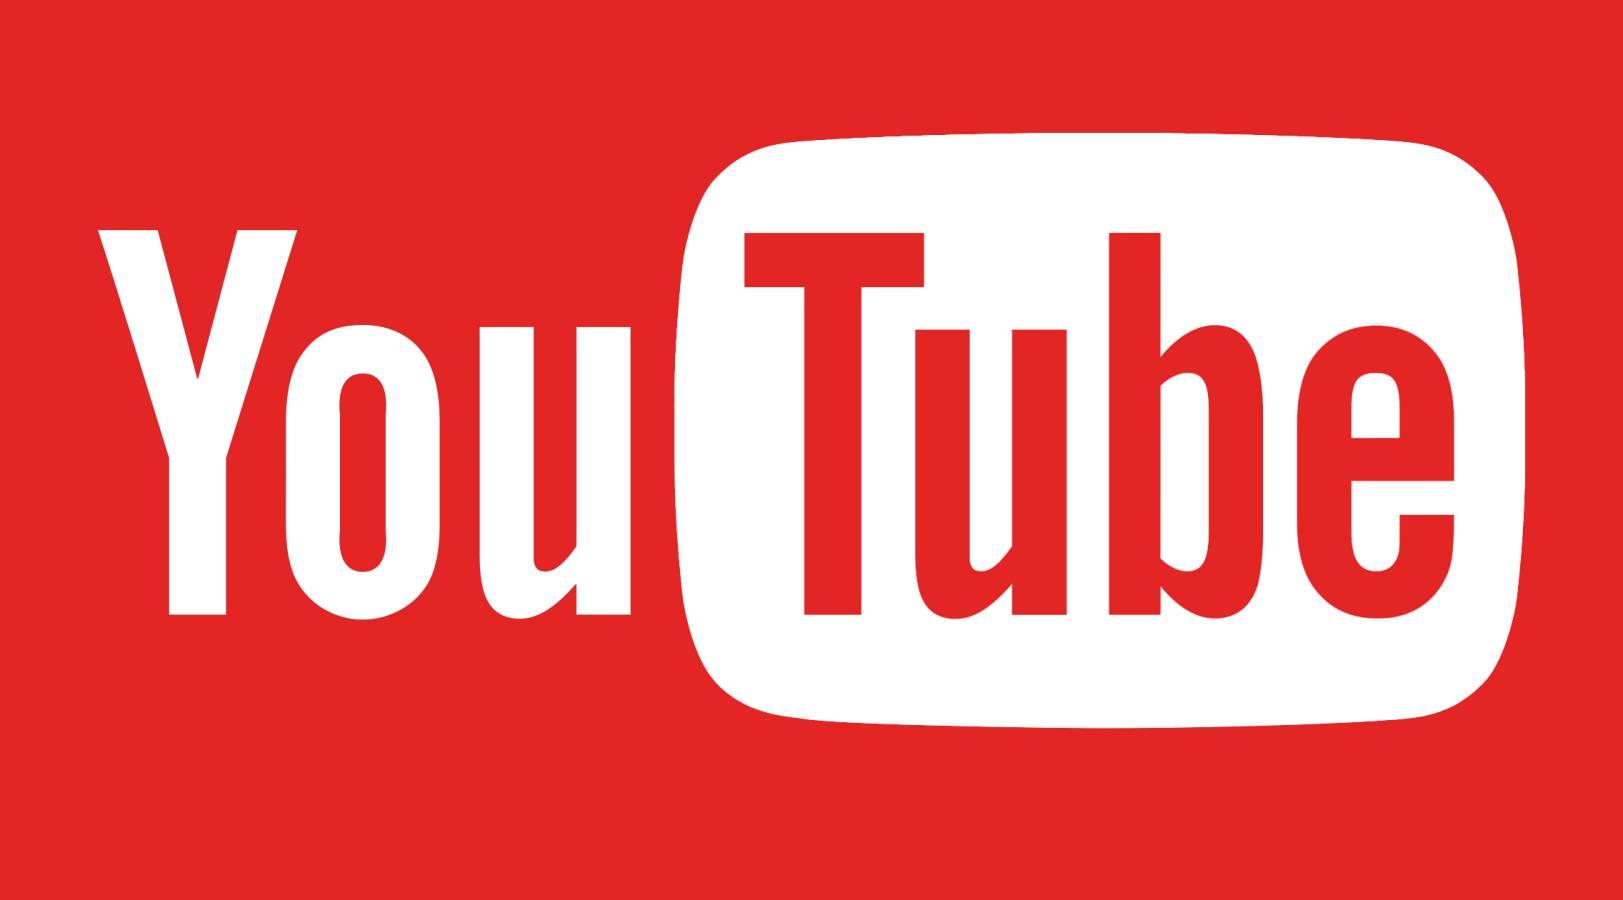 YouTube Update Nou Oferit pentru Telefoane si Tablete